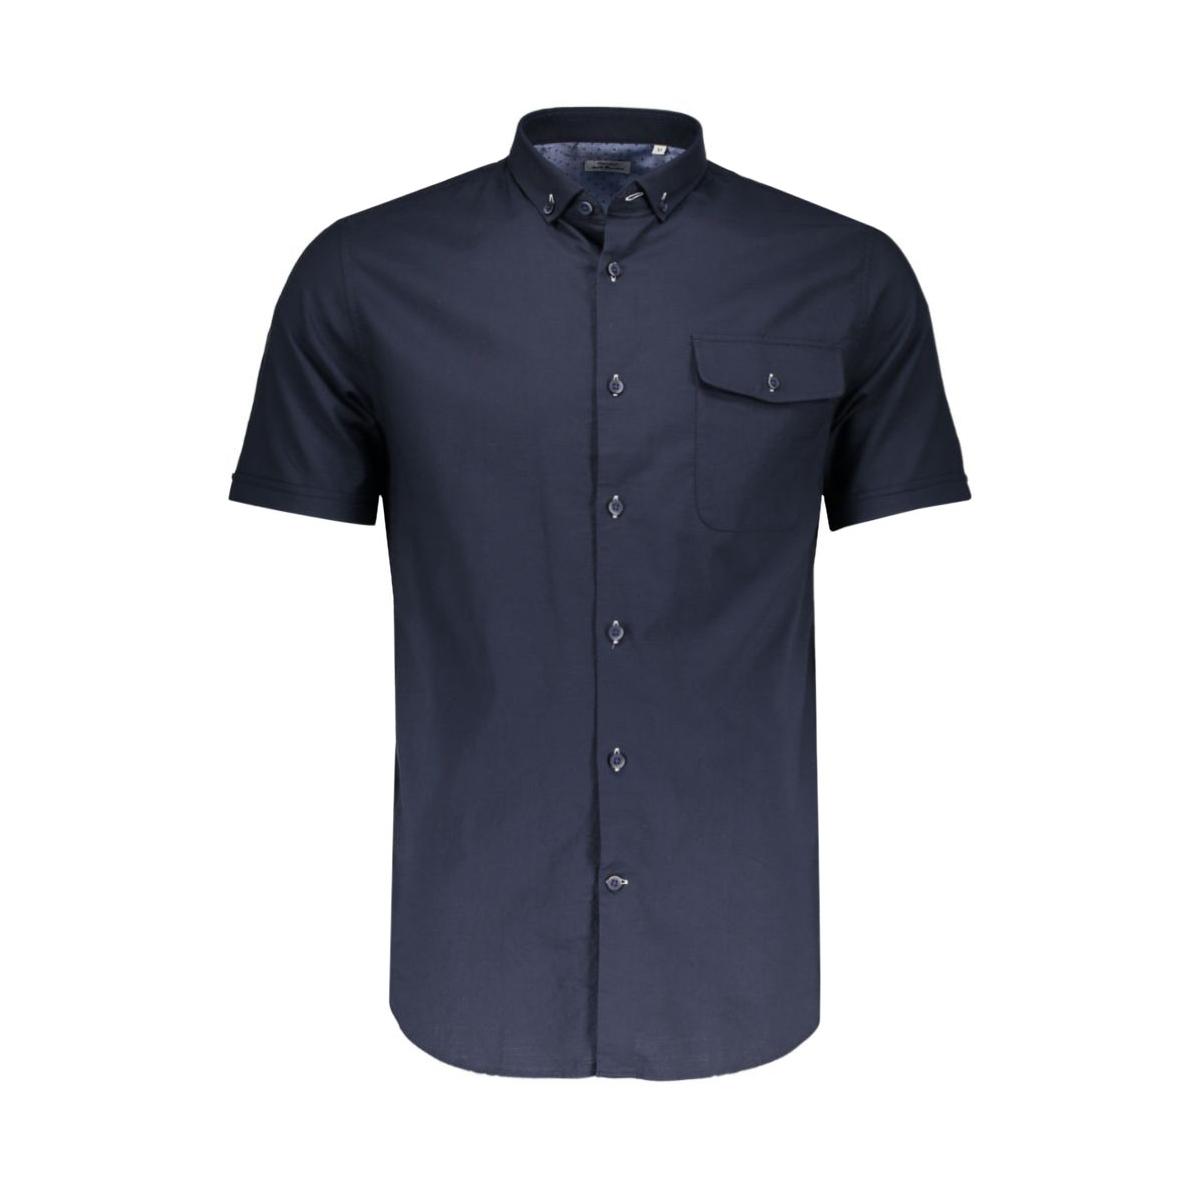 30200934 matinique overhemd 20210